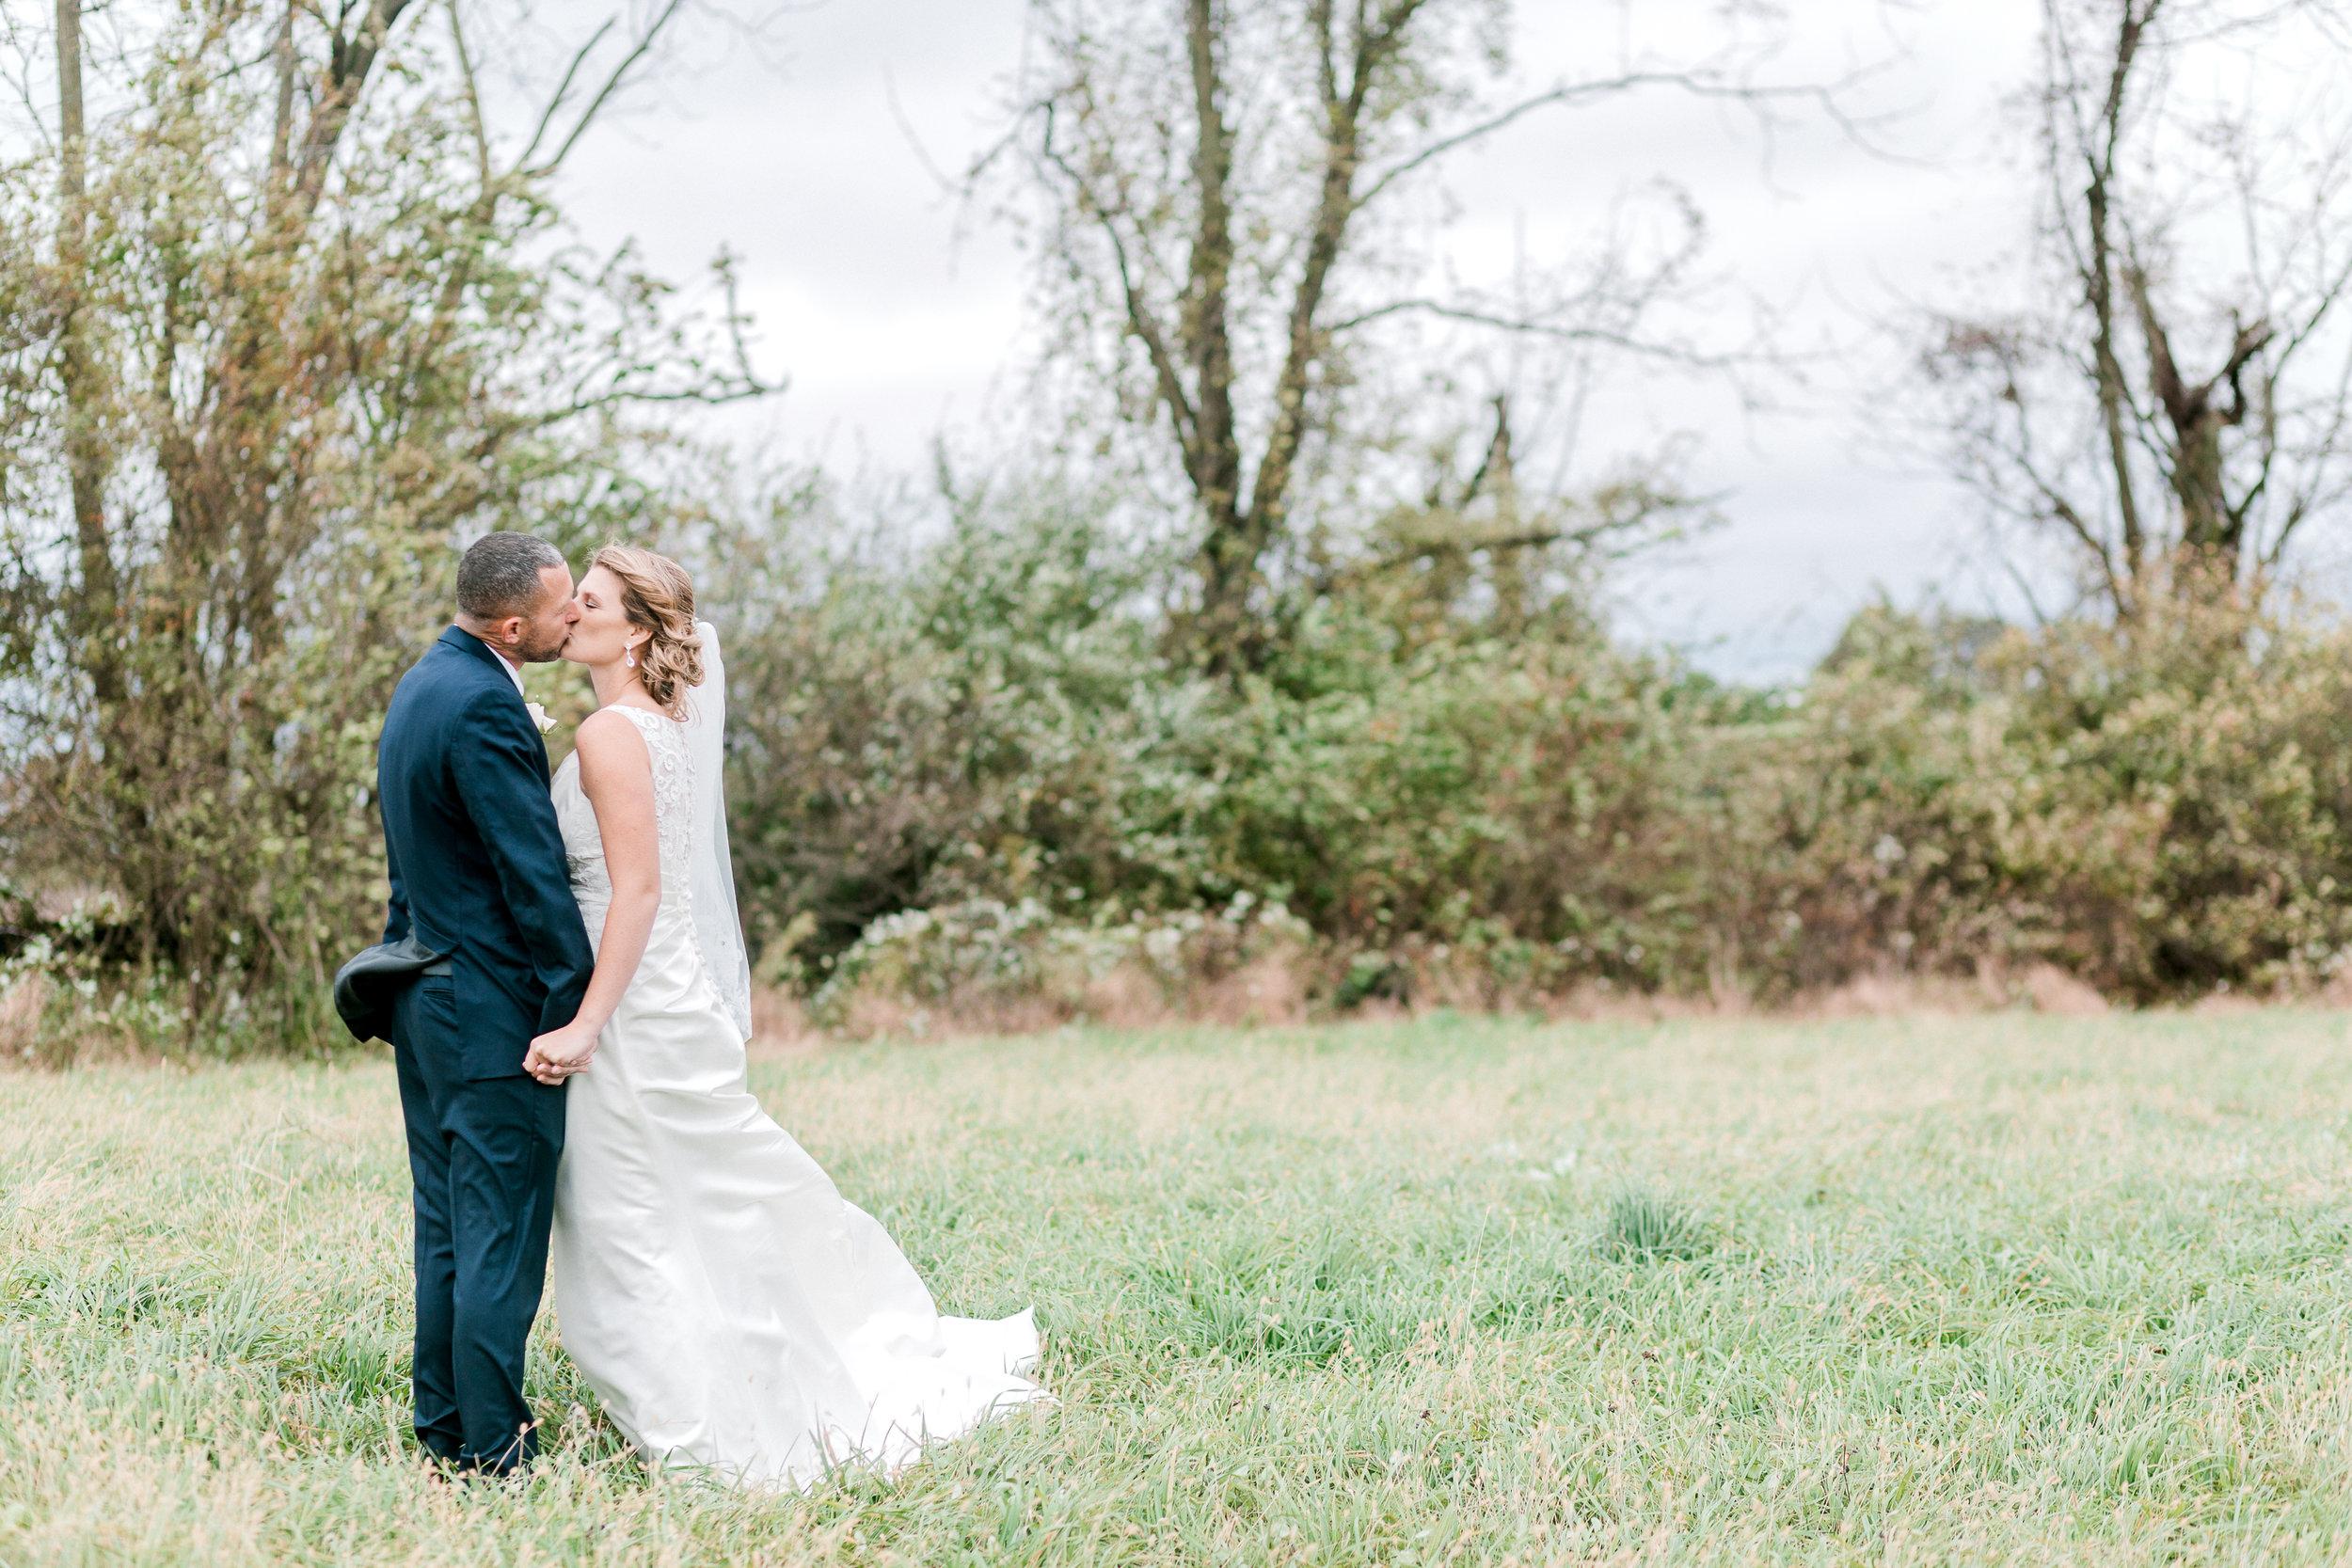 Pennsylvania October Fall Lehigh Valley wedding and lifestyle photographer Lytle Photo Co (99 of 167).jpg